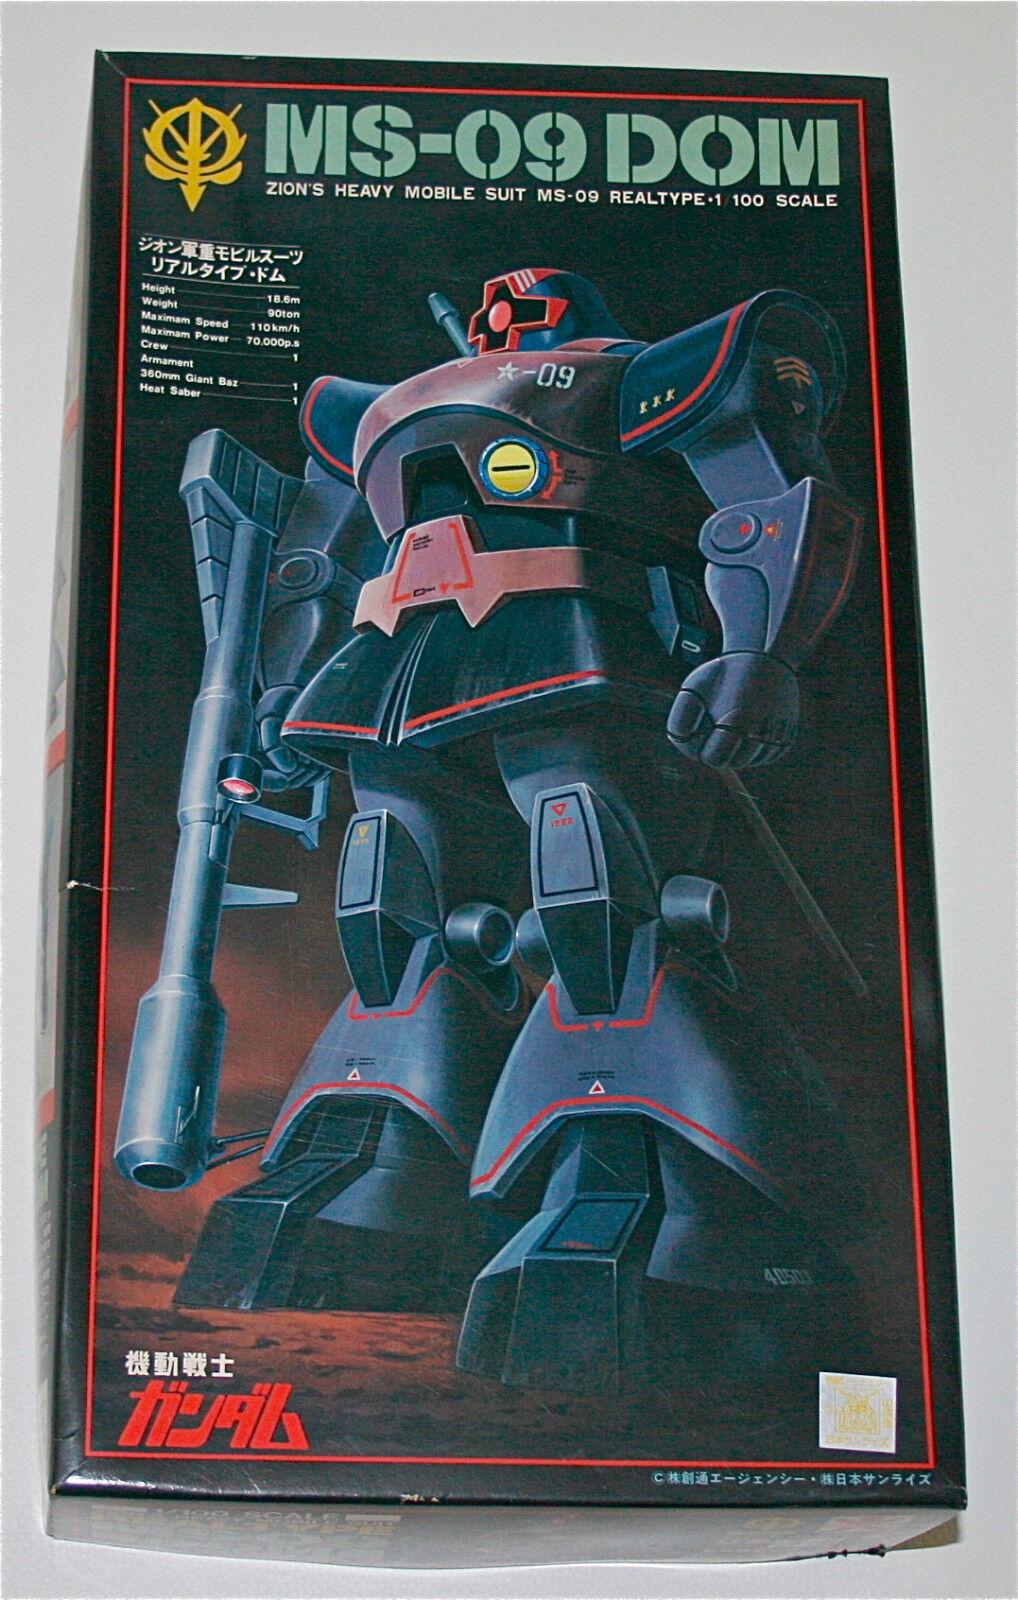 Vintage BANDAI Gundam 1 100 ZION MS-09 DOM Original Plastic Model Kit1980s JAPAN